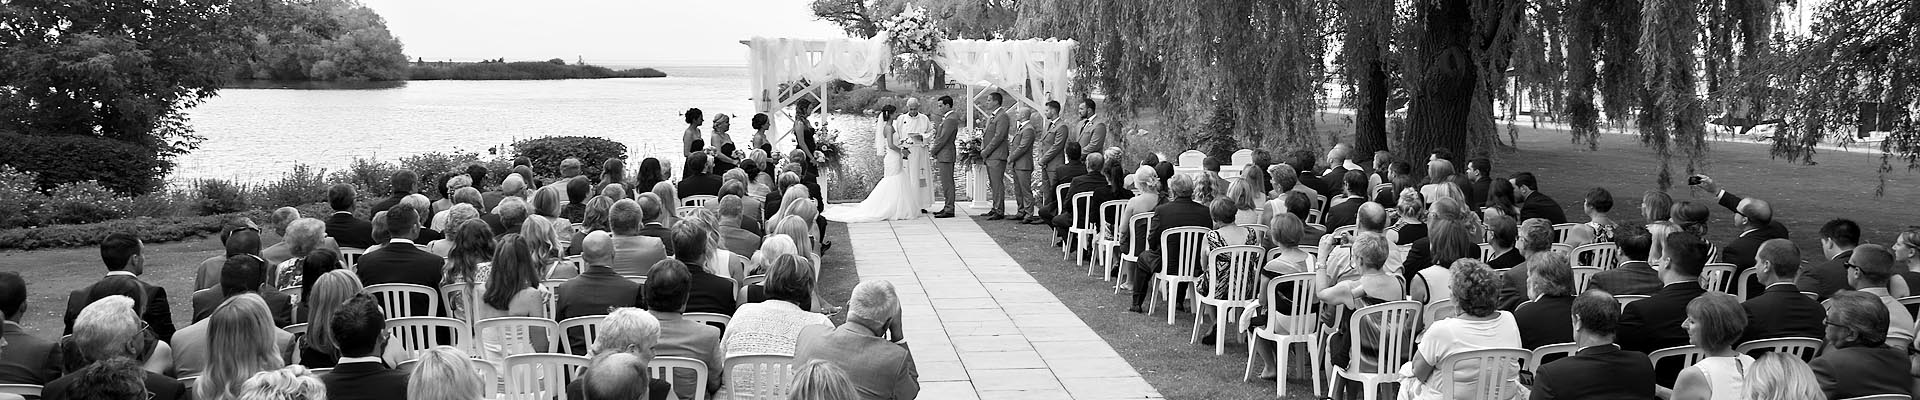 Wedding ceremony at Cranberry Resort